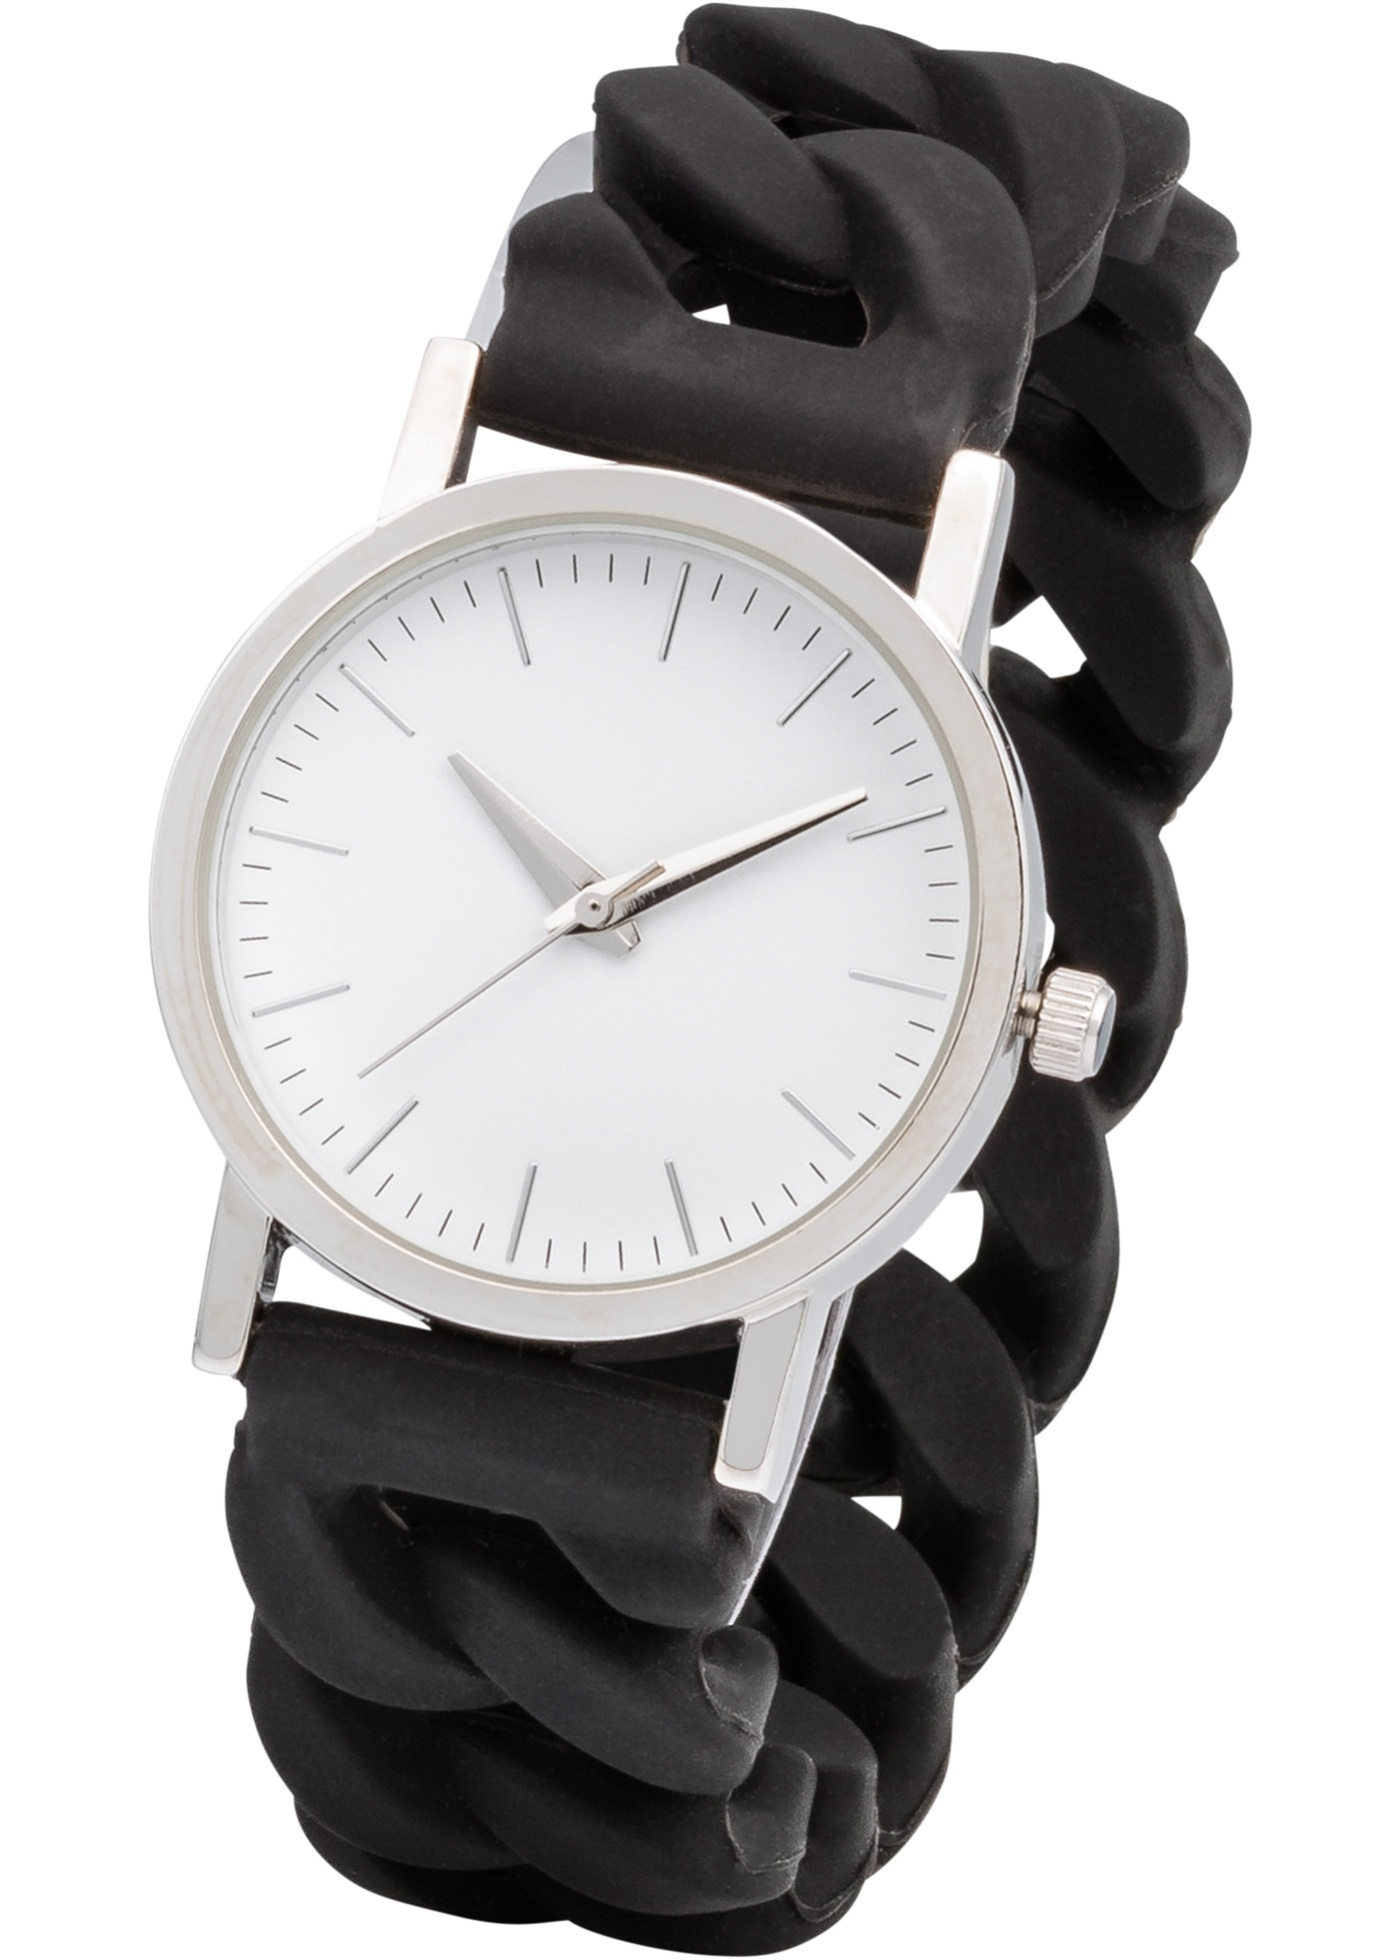 Silikonové hodinky - Černá 44a59b1283